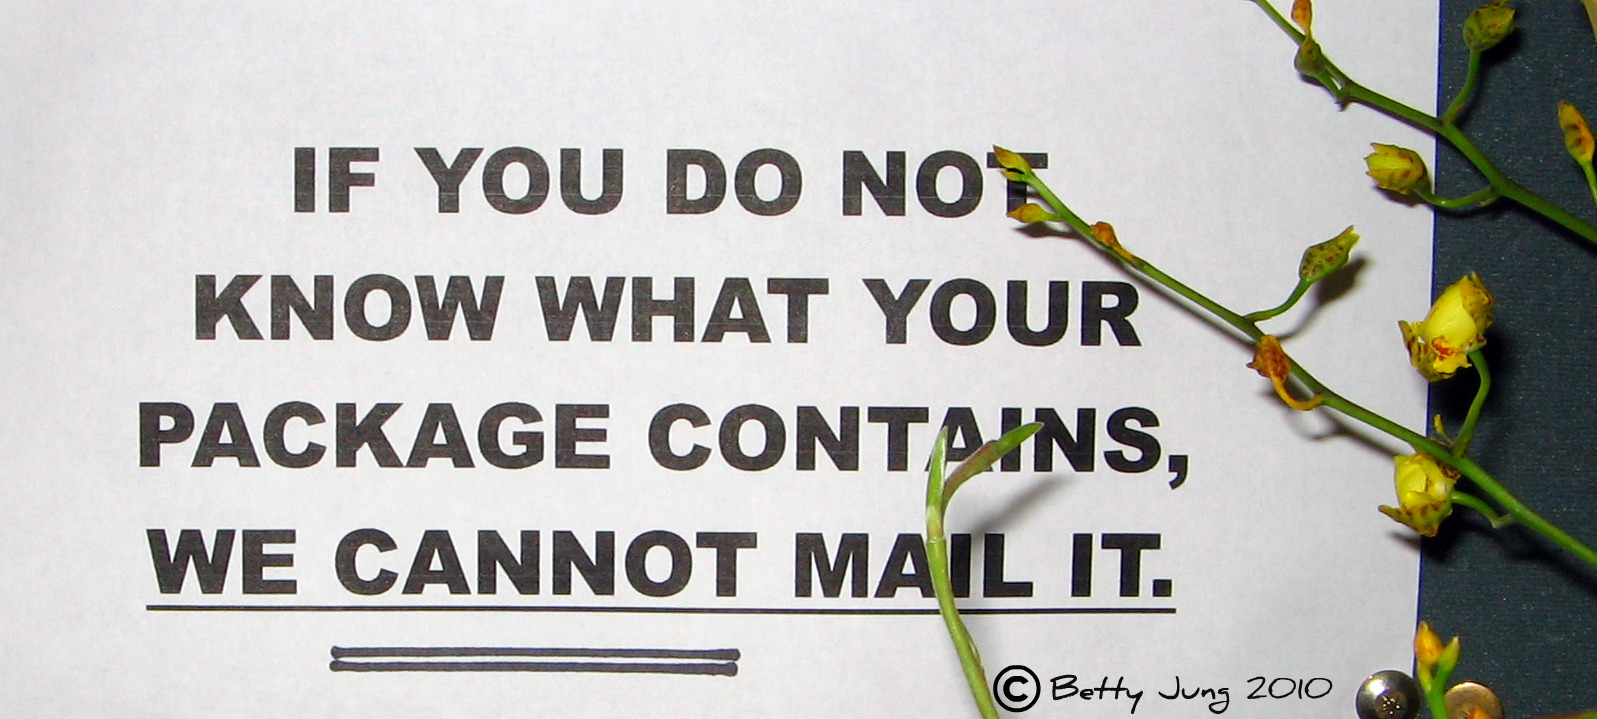 Post Office Humor wallpaper   ForWallpapercom 1597x719